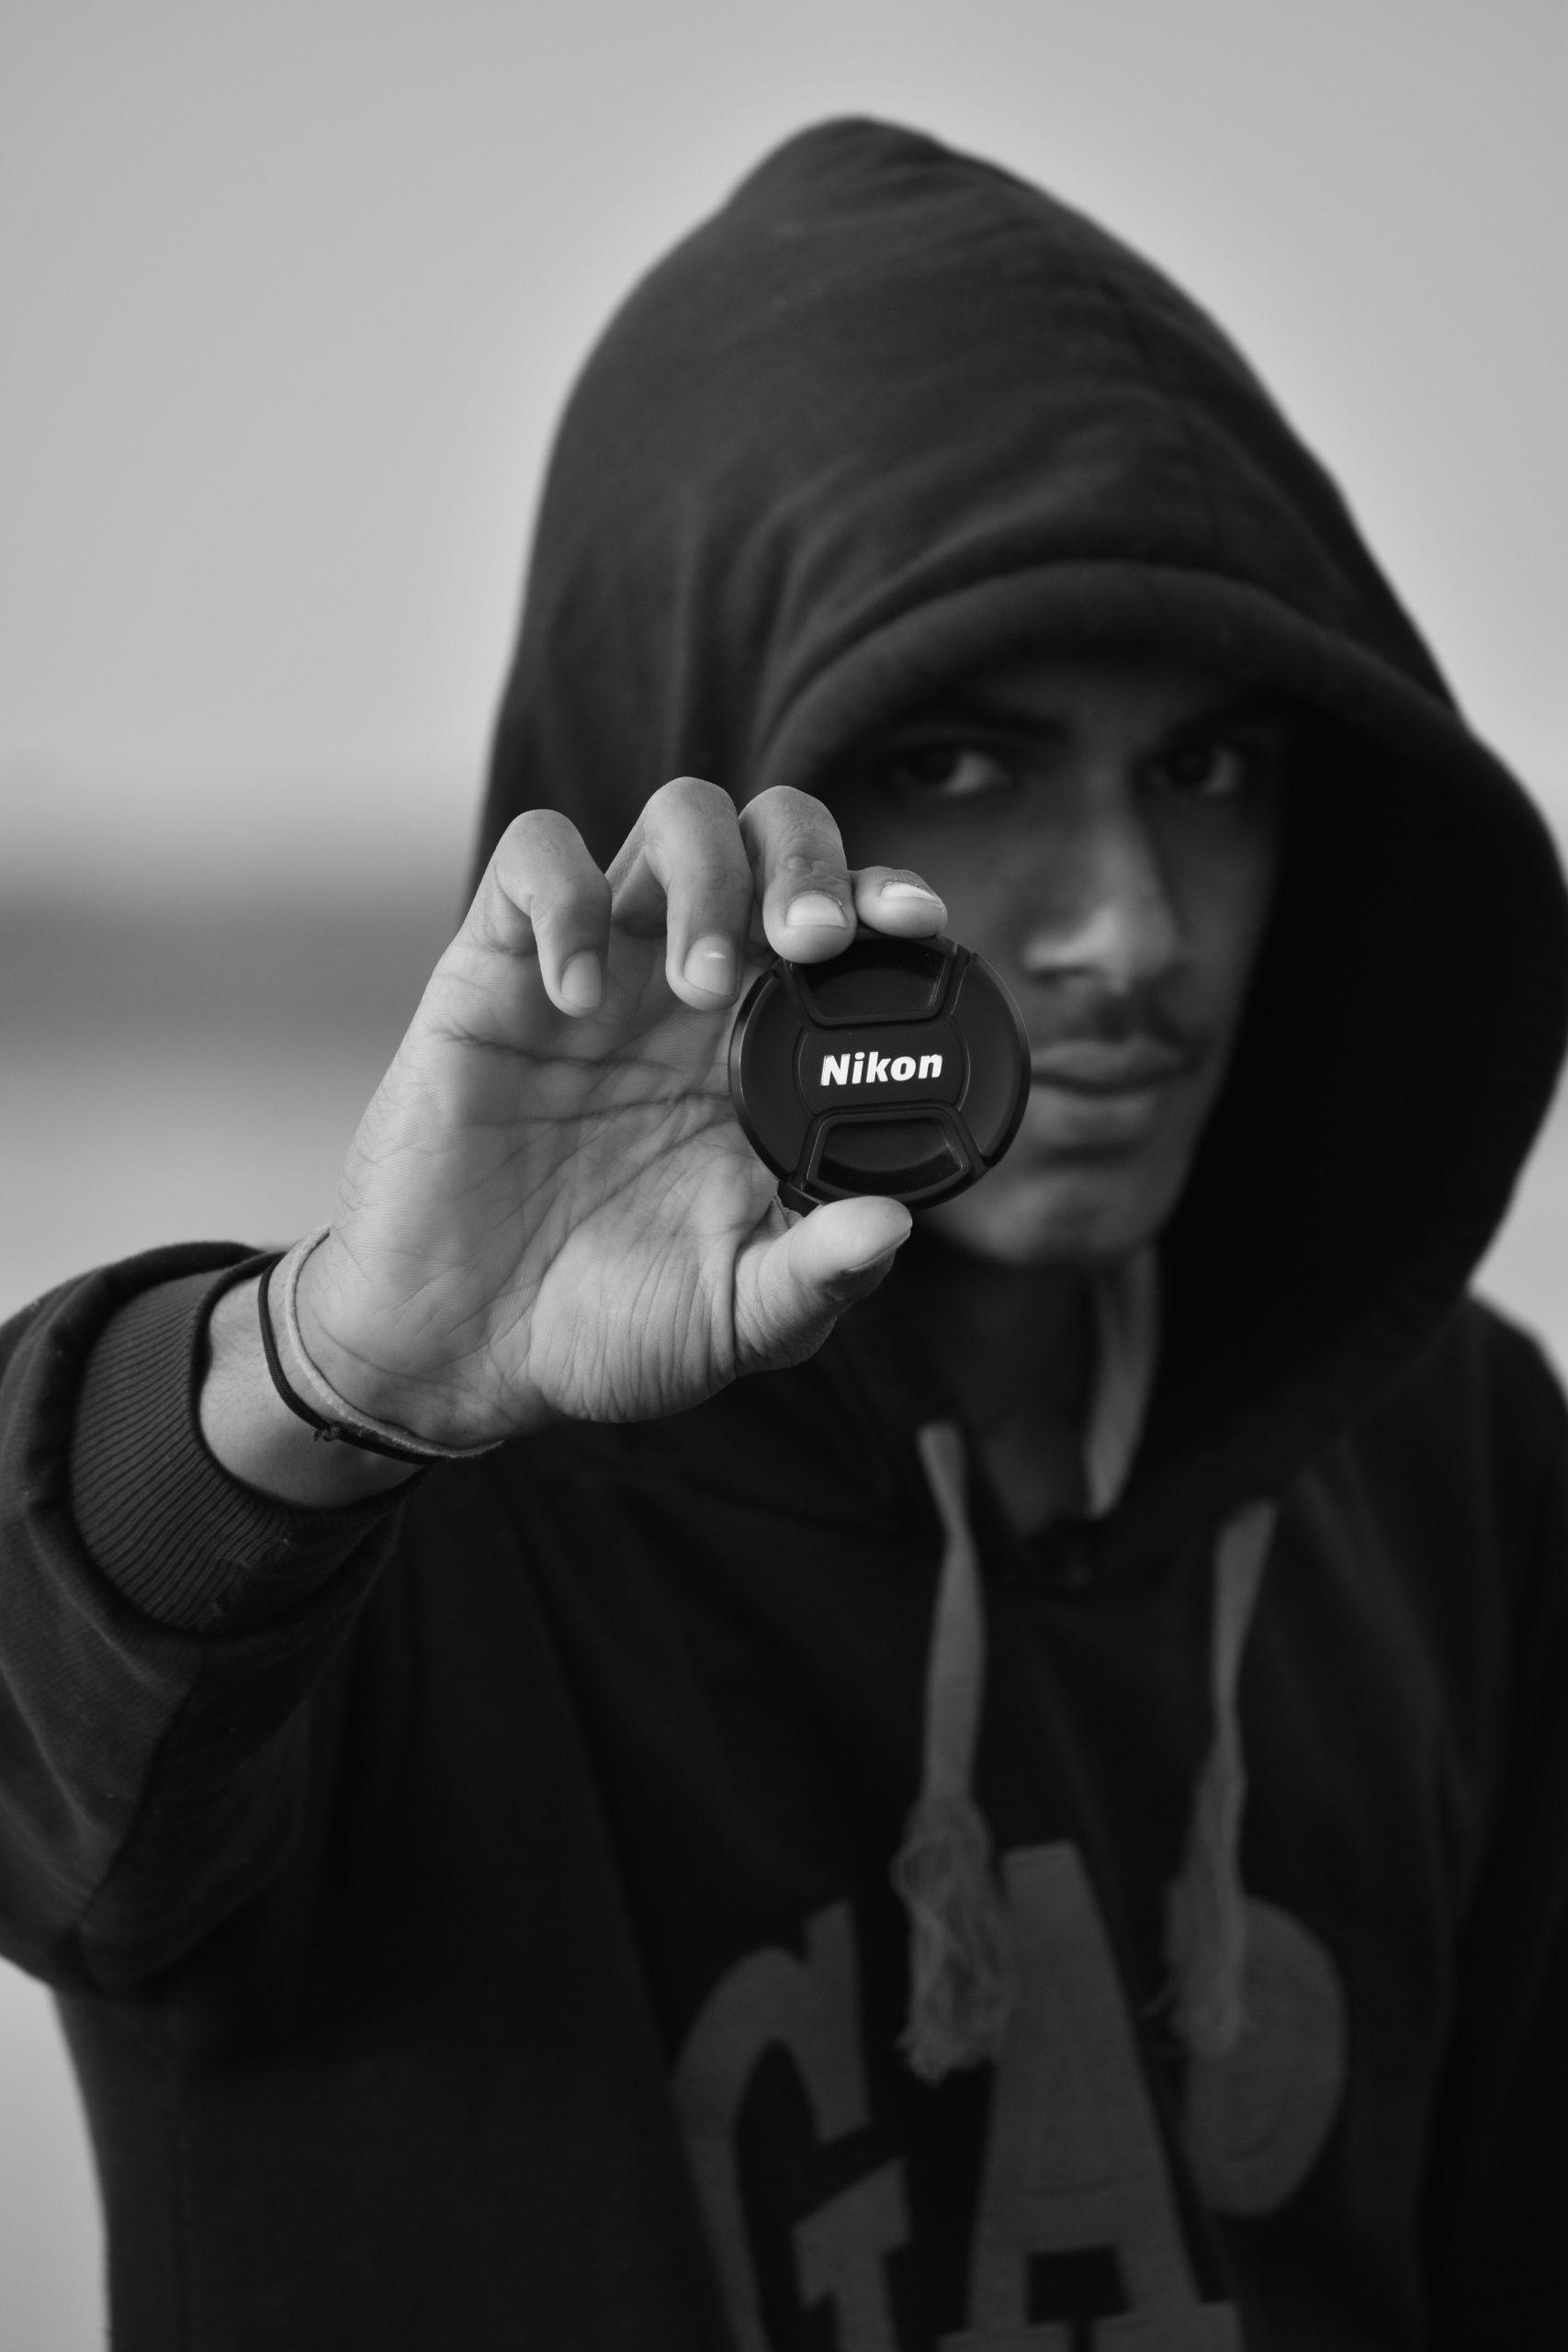 Boy posing with Nikon lens cap